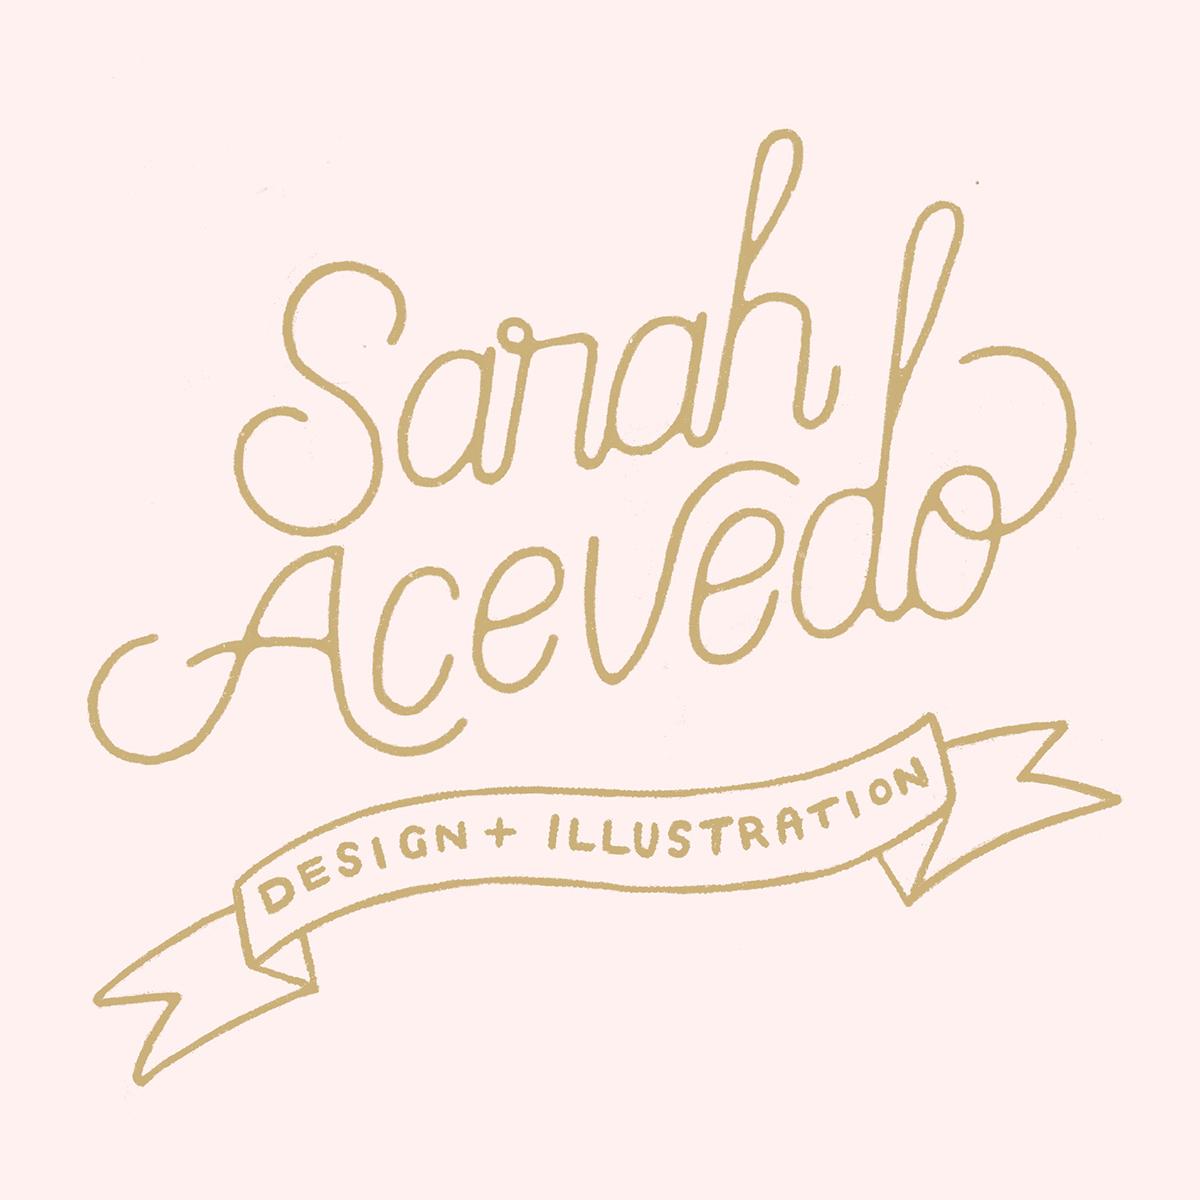 Sarah_Acevedo.jpg